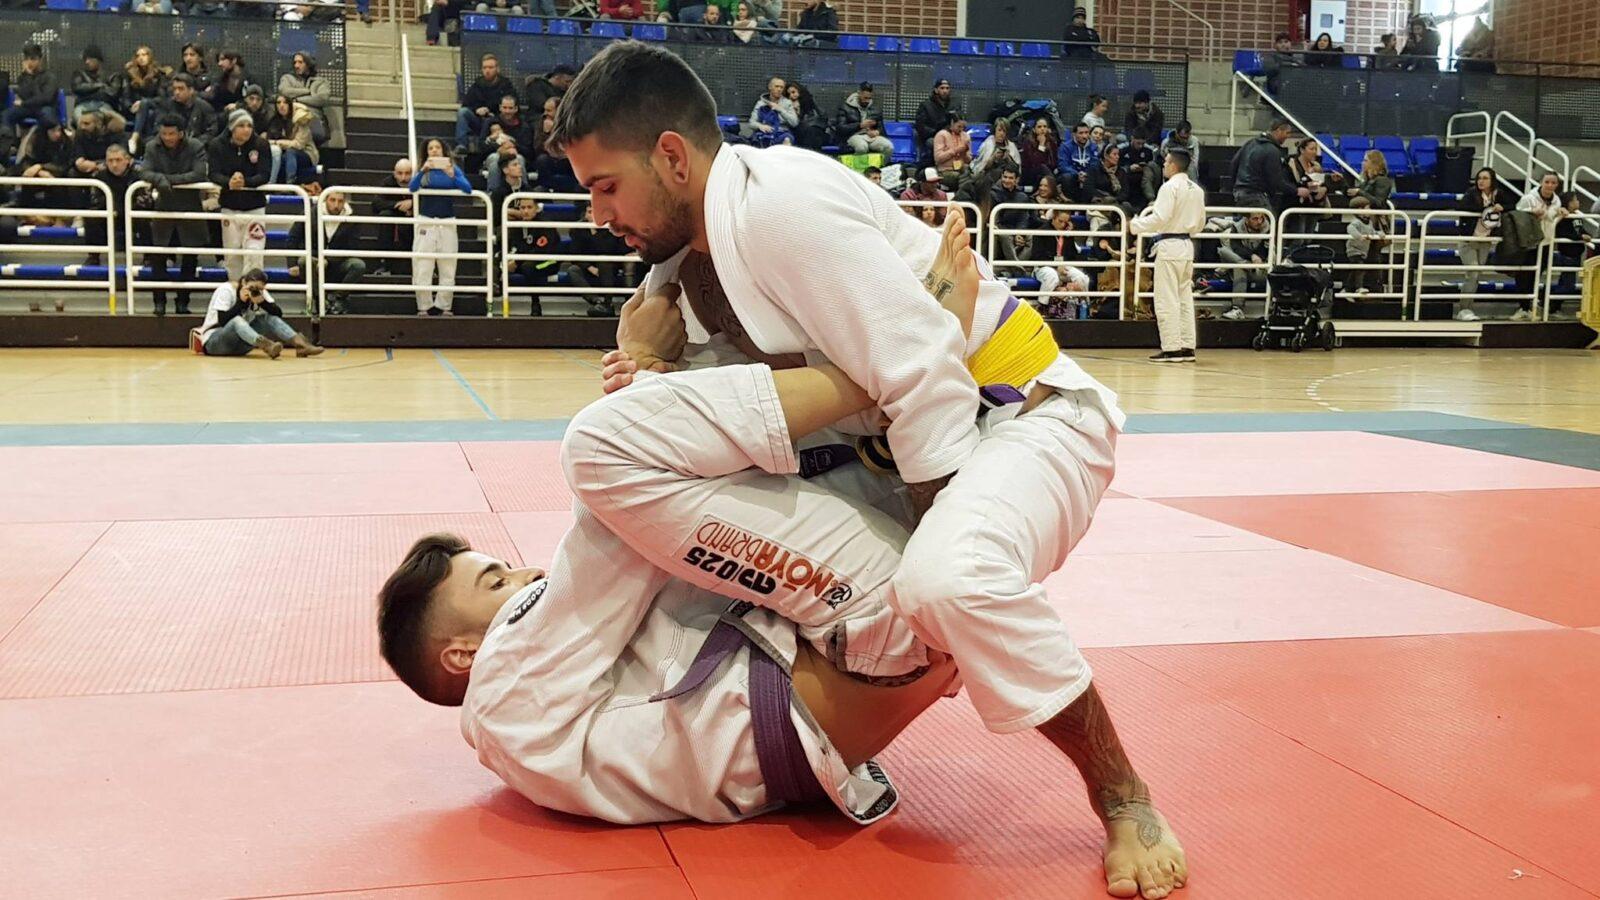 BJJ SA FIGHT COMPANY EN BILBAO